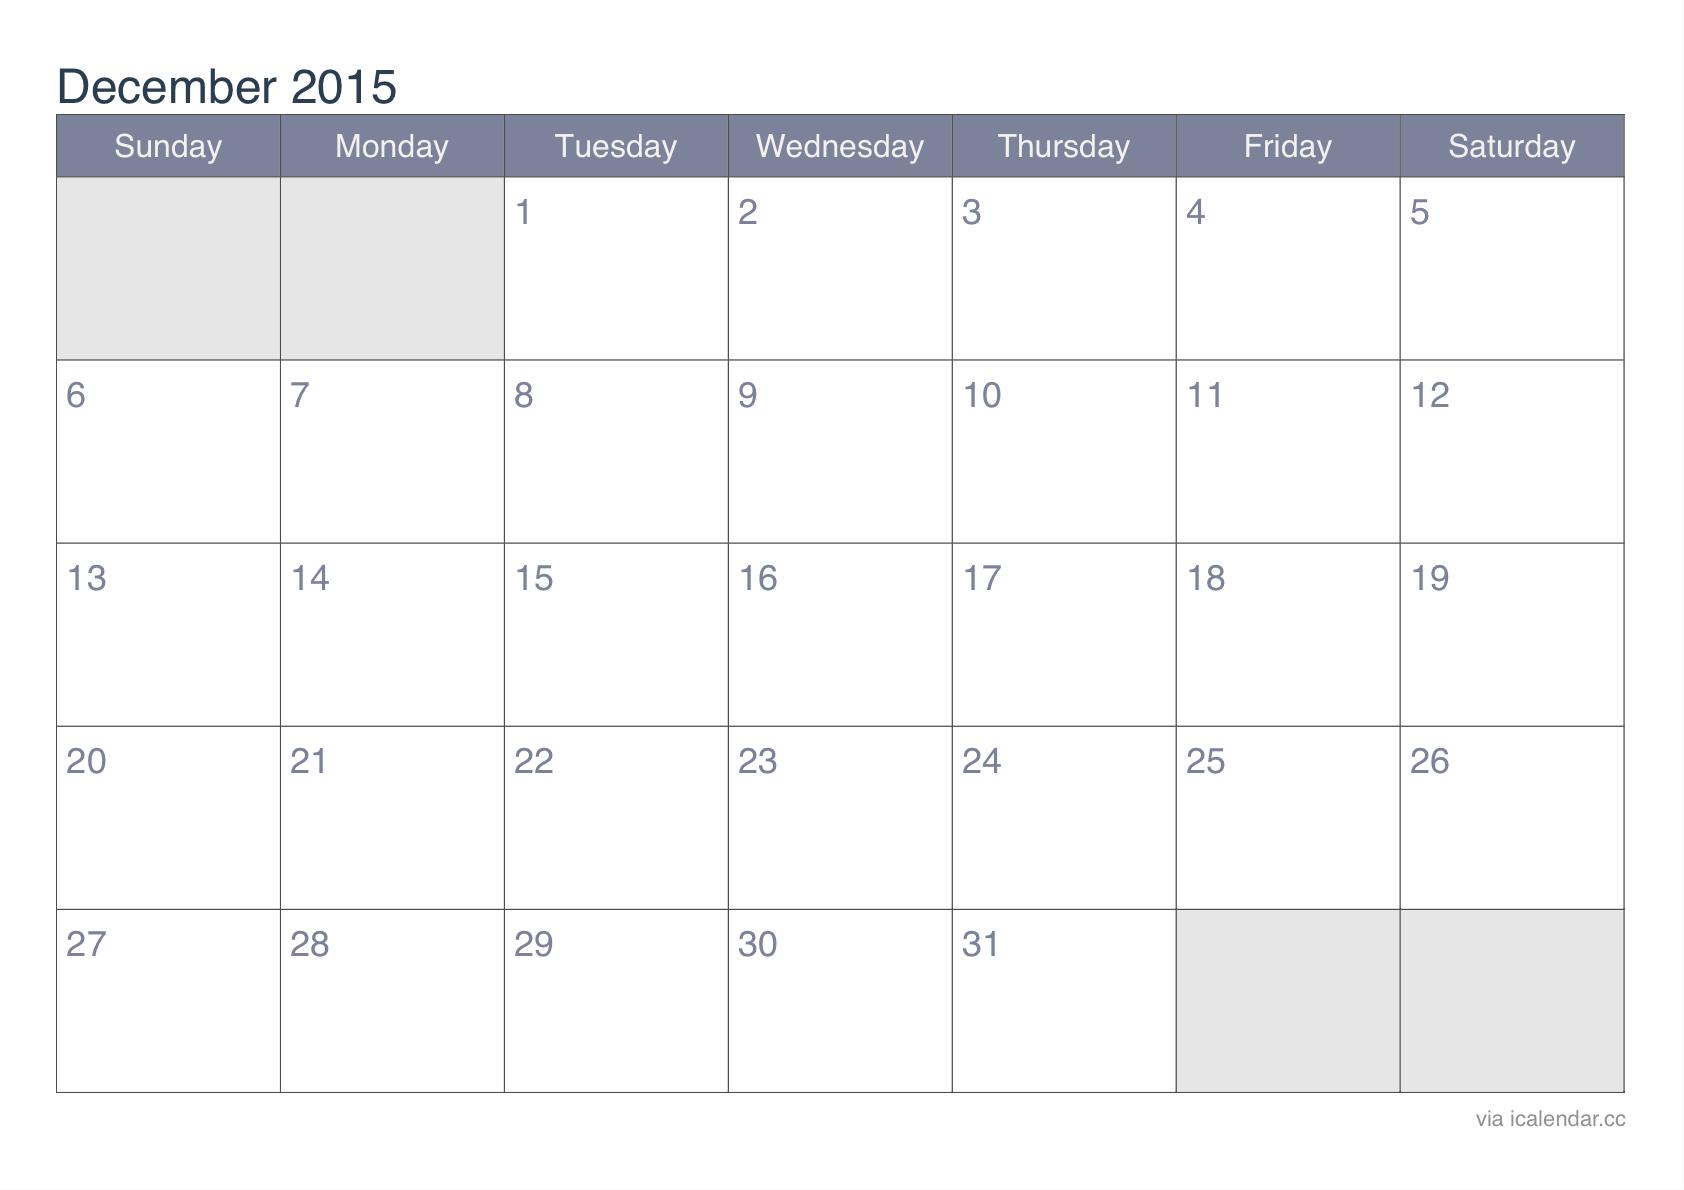 December 2015 Printable Calendar  Icalendars with December 2015 Calendar Printable